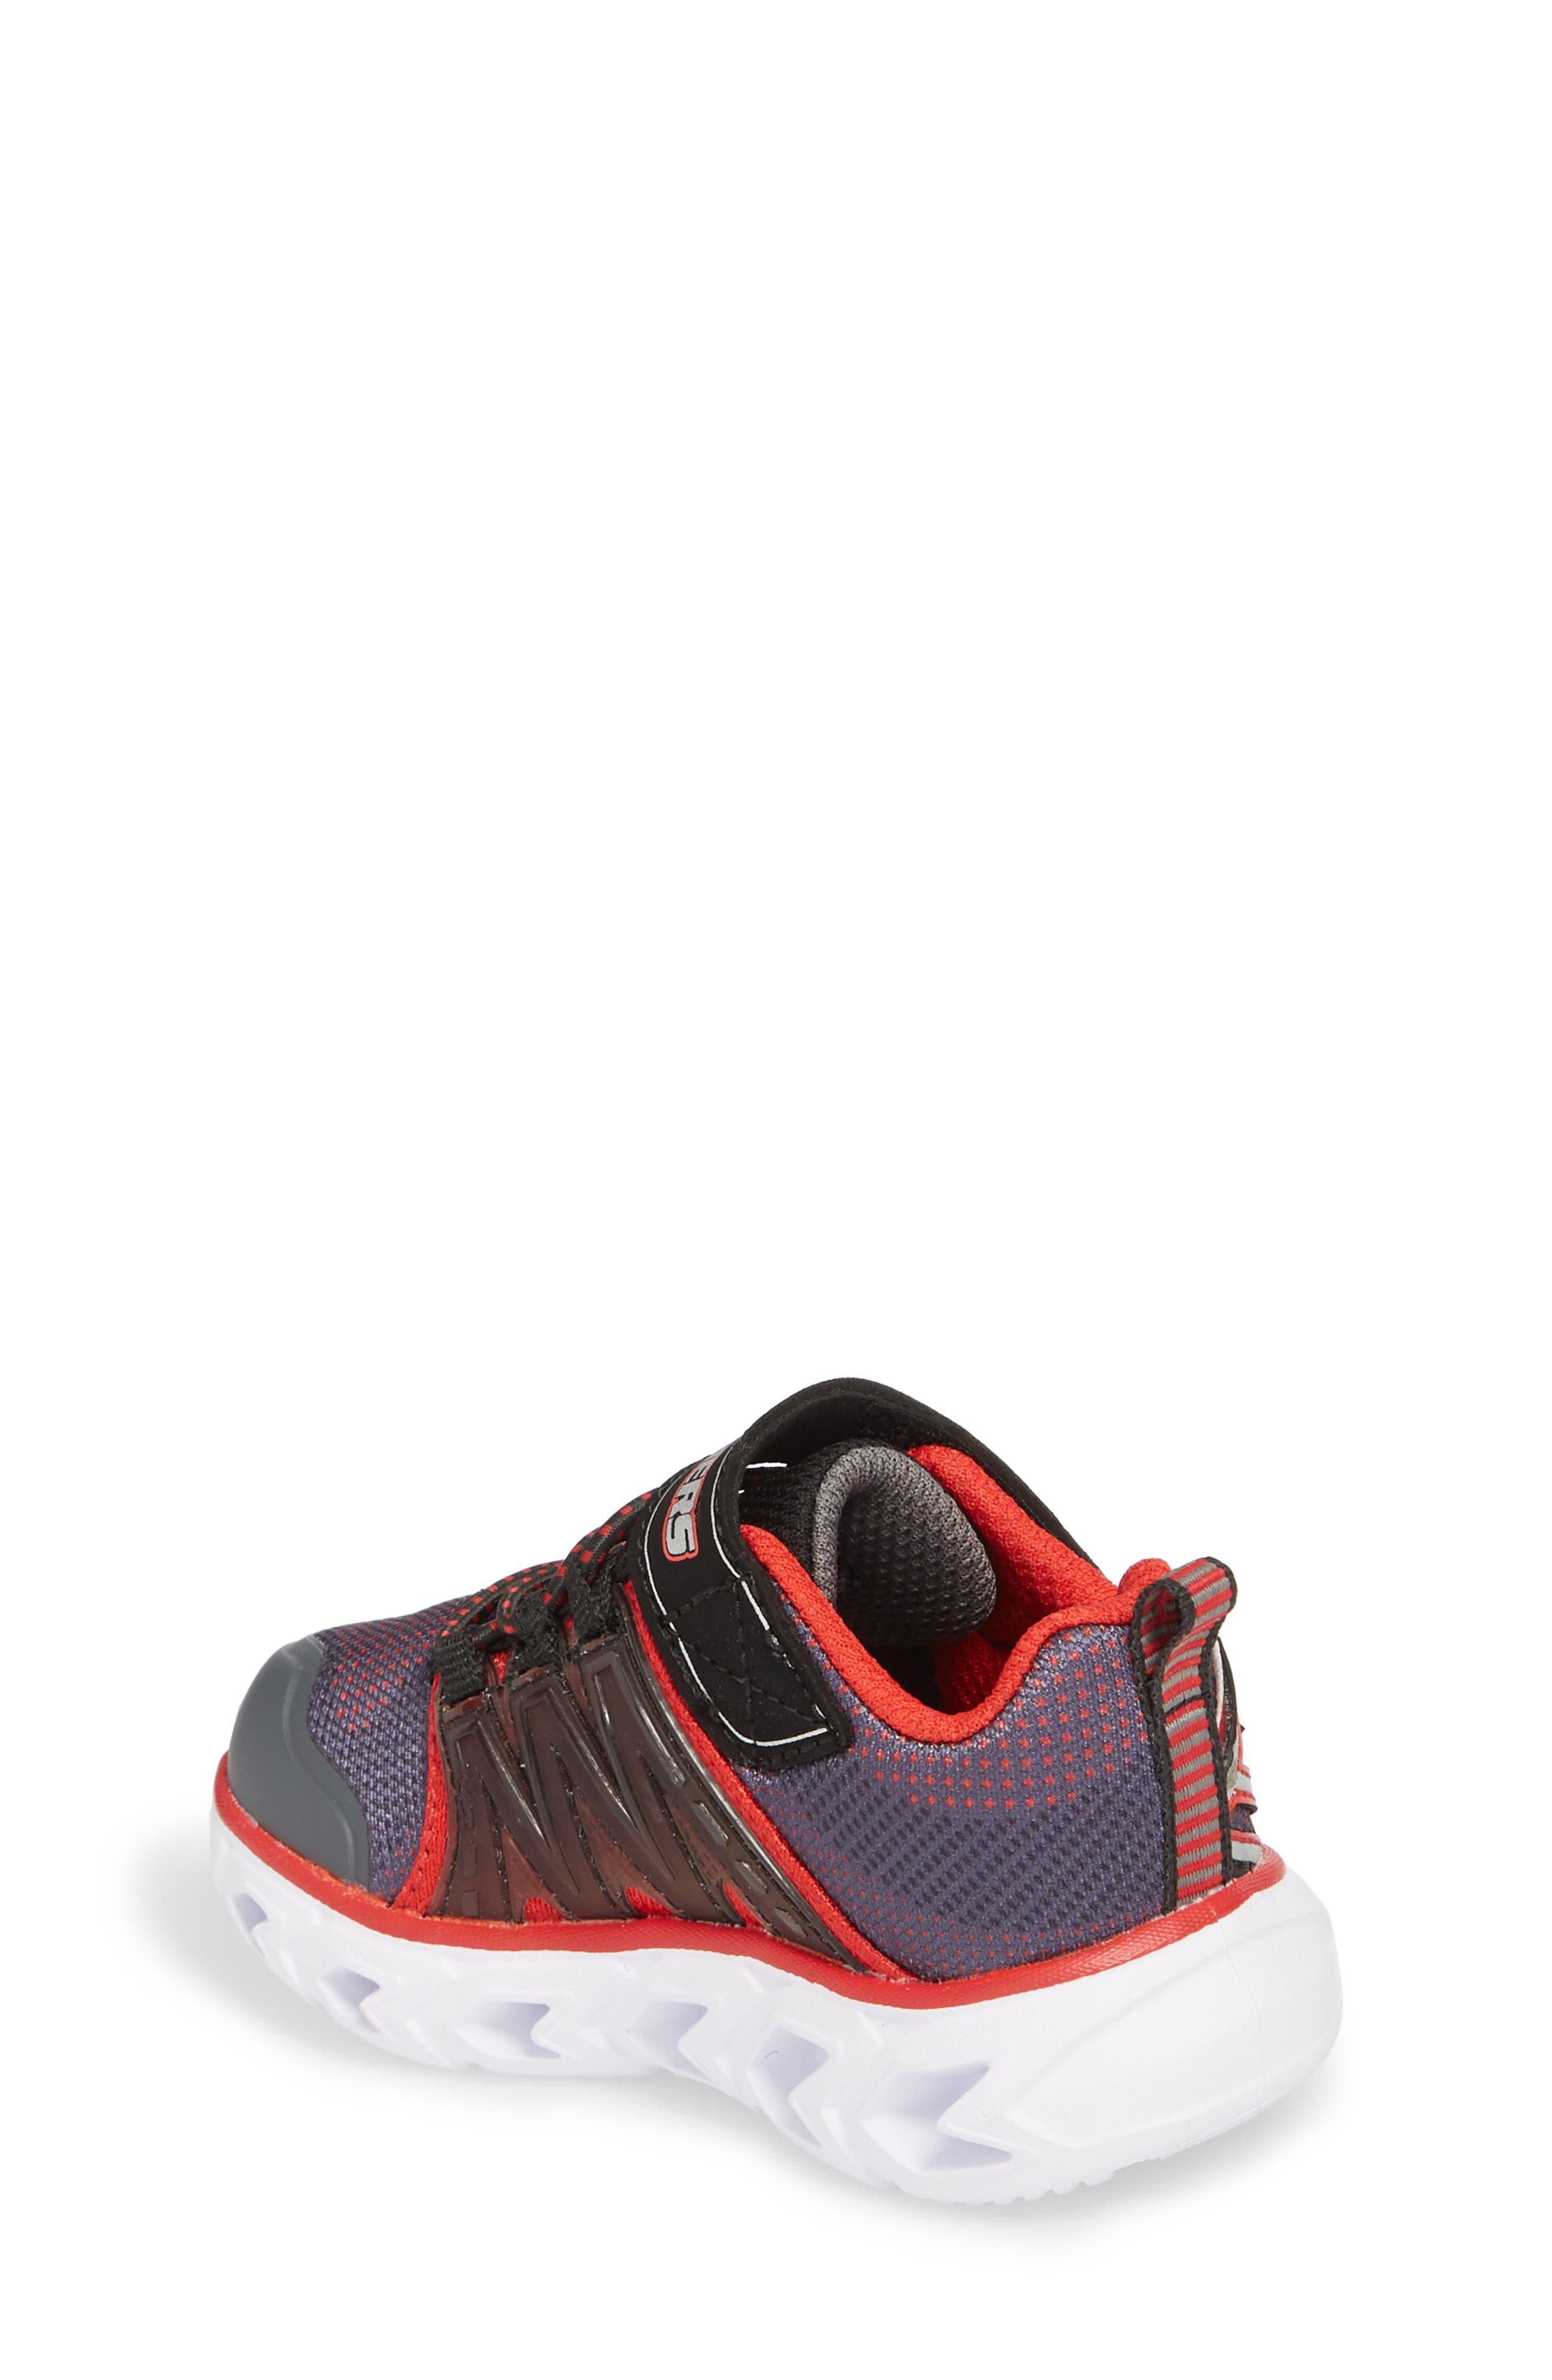 Hypno-Flash 2.0 Sneakers,                             Alternate thumbnail 4, color,